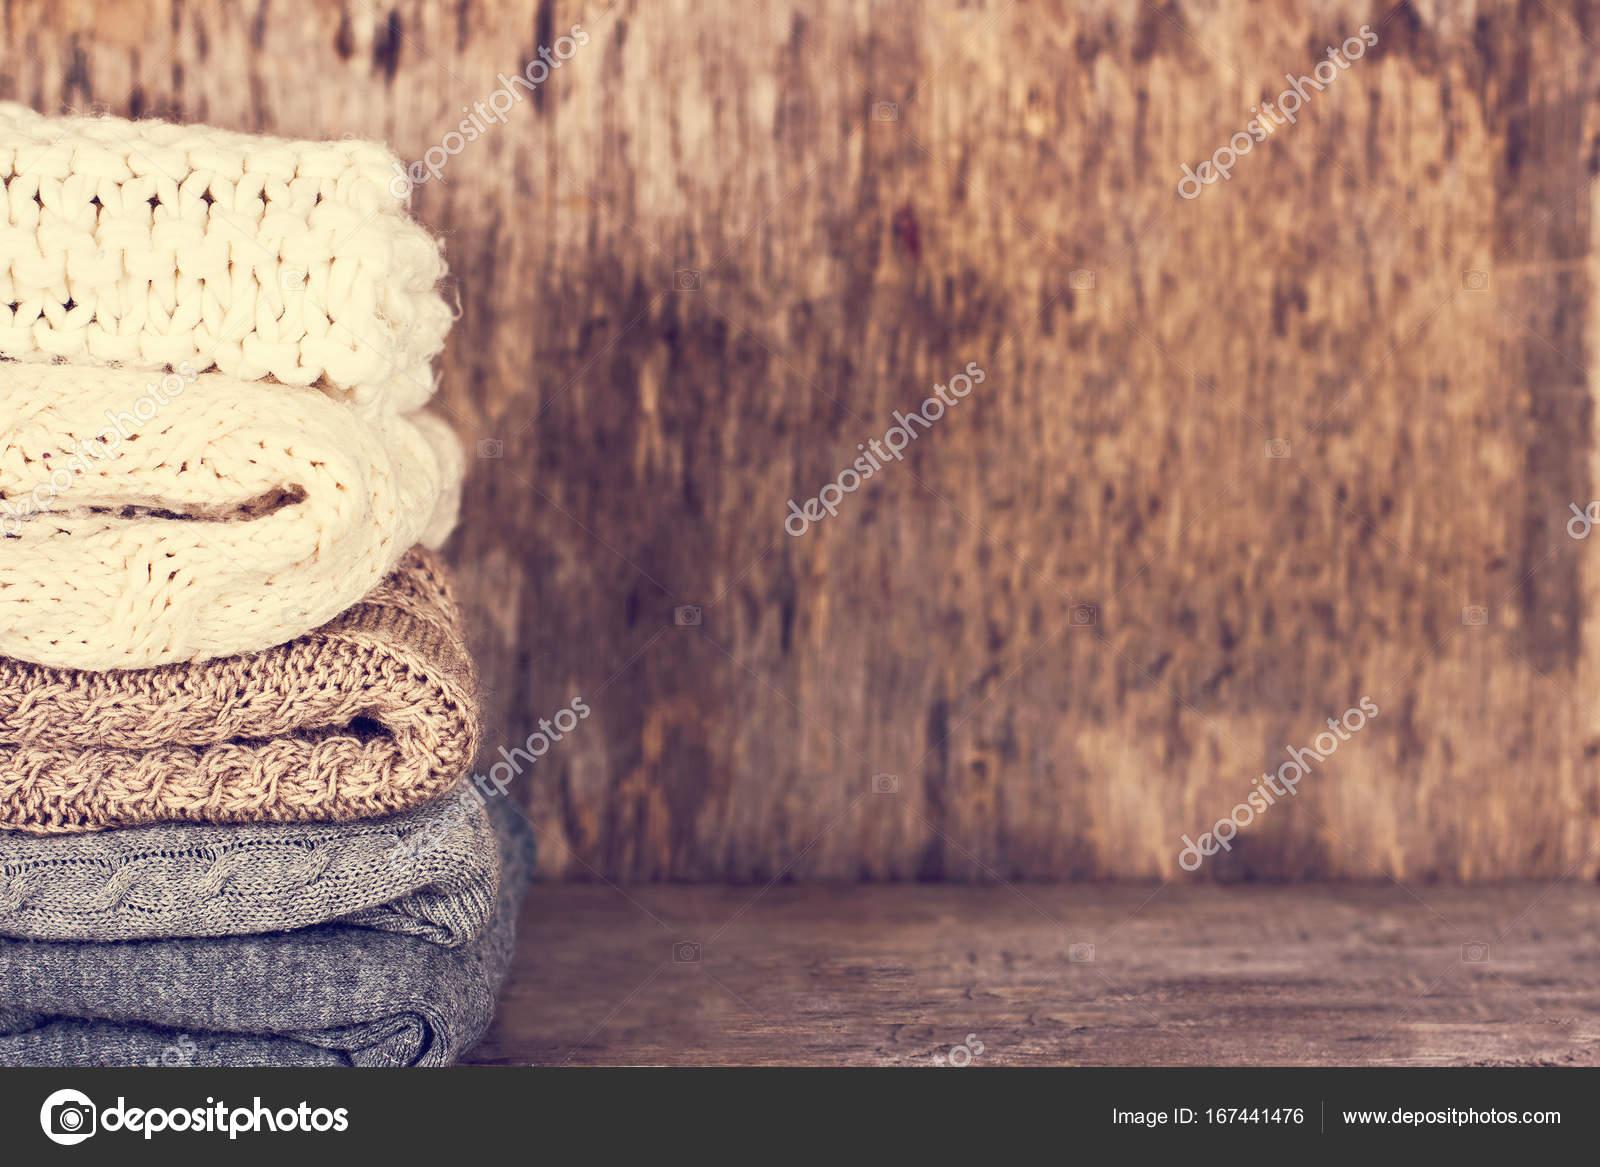 fa58ff21d549 Μια στοίβα από μάλλινα πουλόβερ